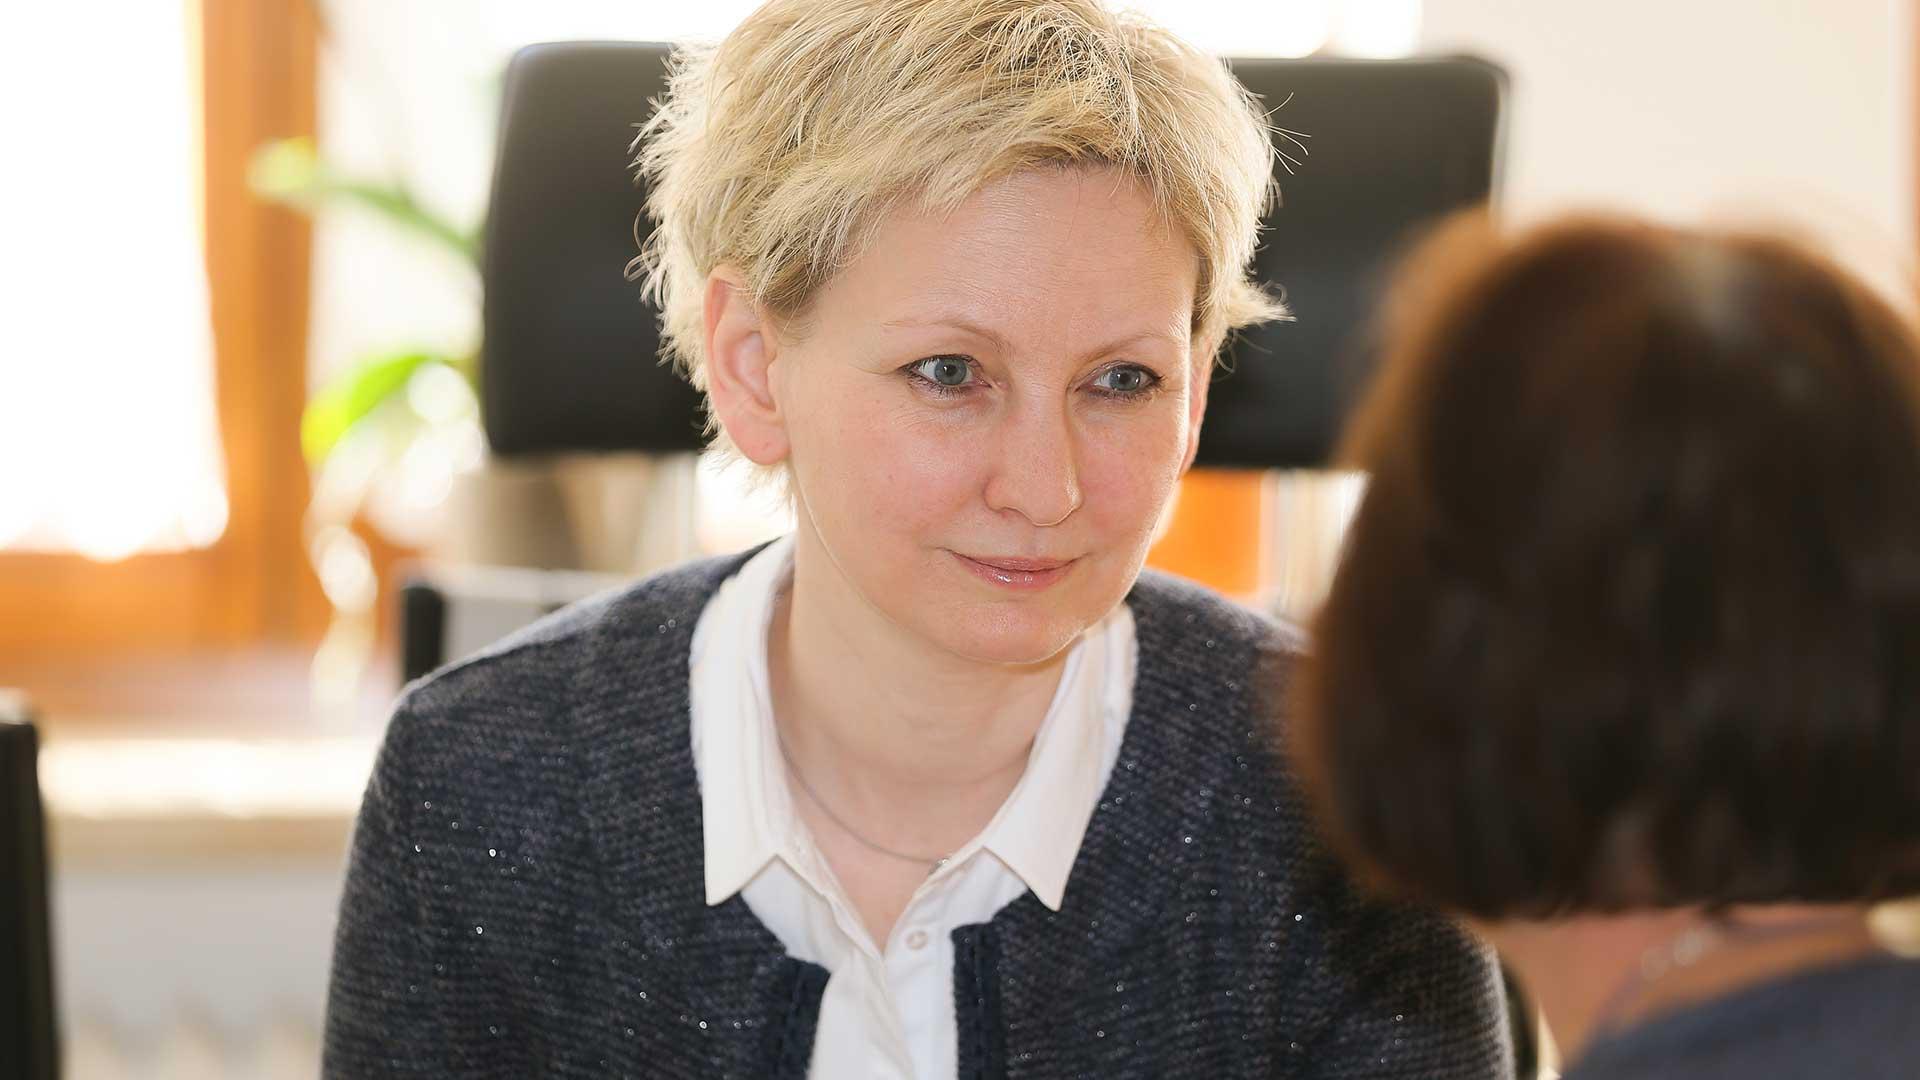 Mediatorin Frau Ebner